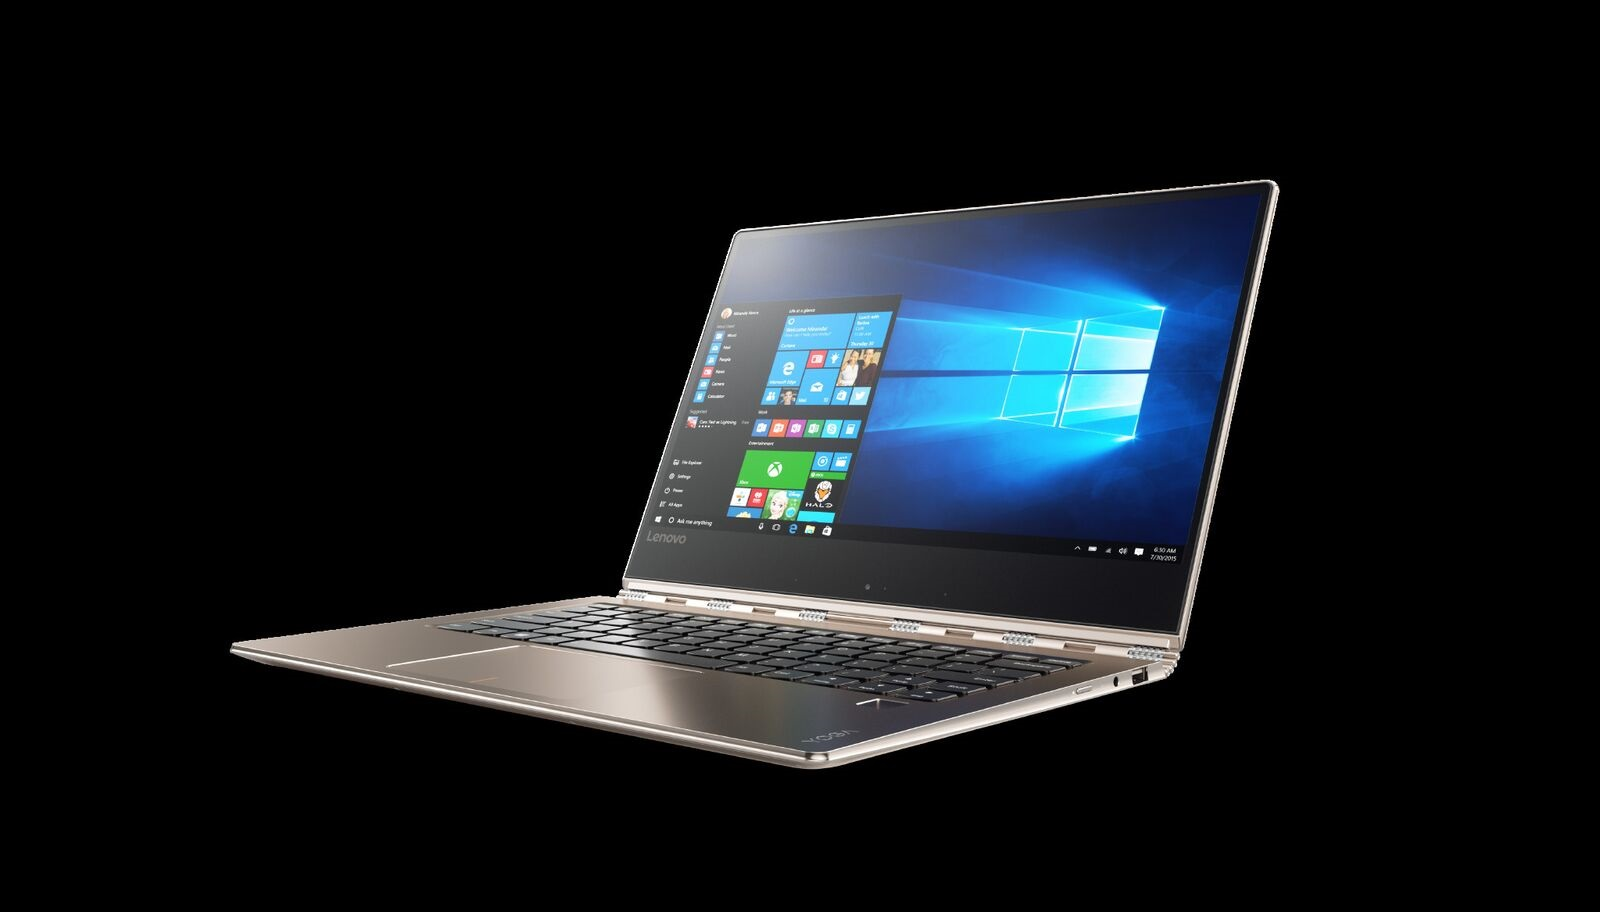 "Lenovo YOGA 910-13IKB i7-7500U 3,50GHz/8GB/SSD 512GB/13,9"" UHD/IPS/multitouch/WIN10 zlatá 80VF00LECK"